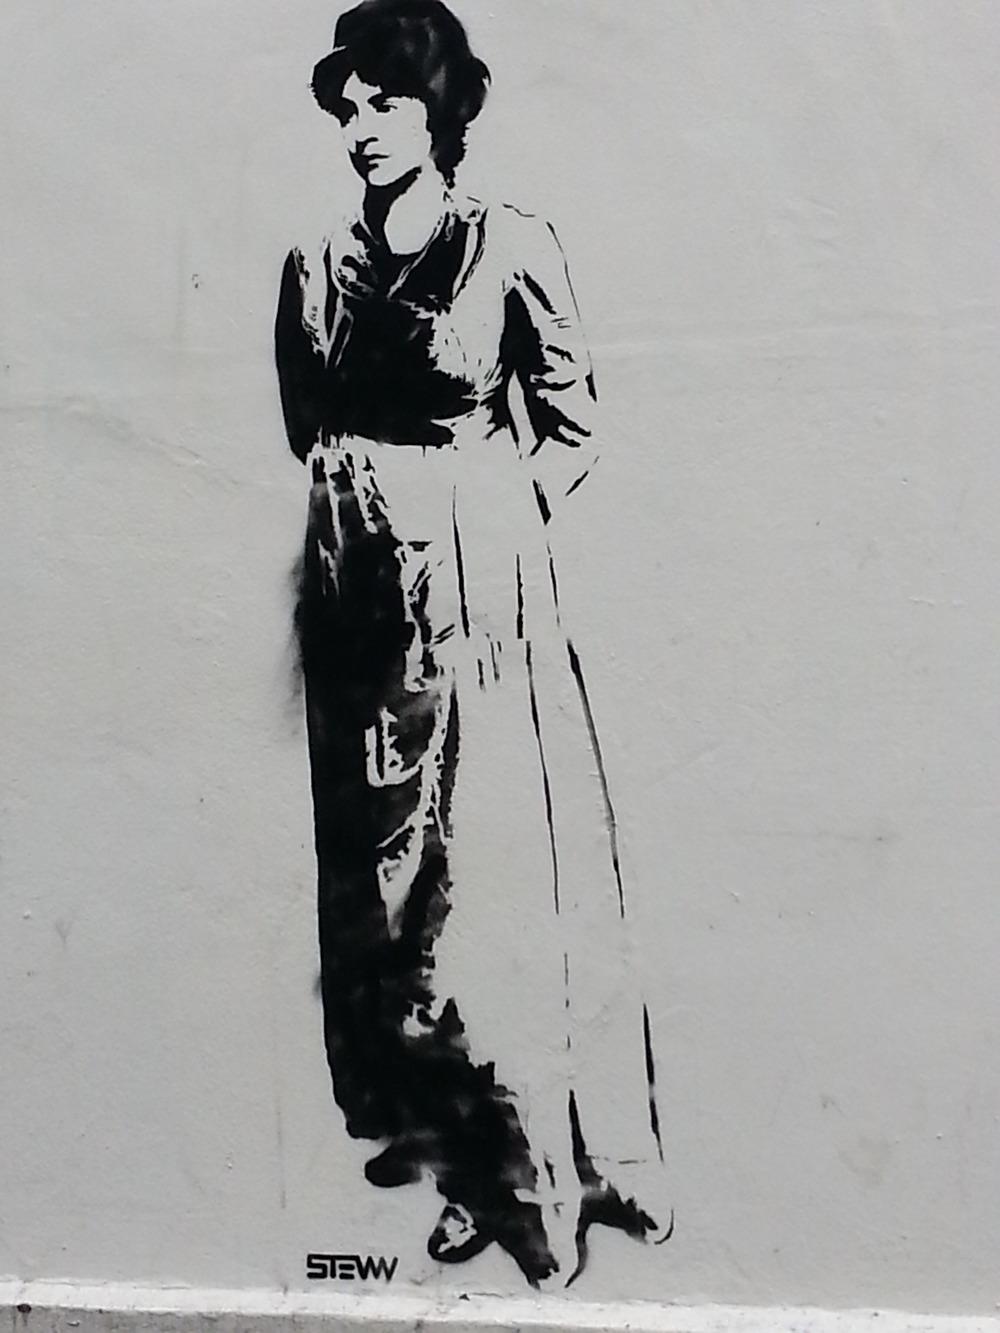 Street-Art-of-Mary-Wollstonecraft-by-Unitarian-Church-Roberta-Wedge.jpg